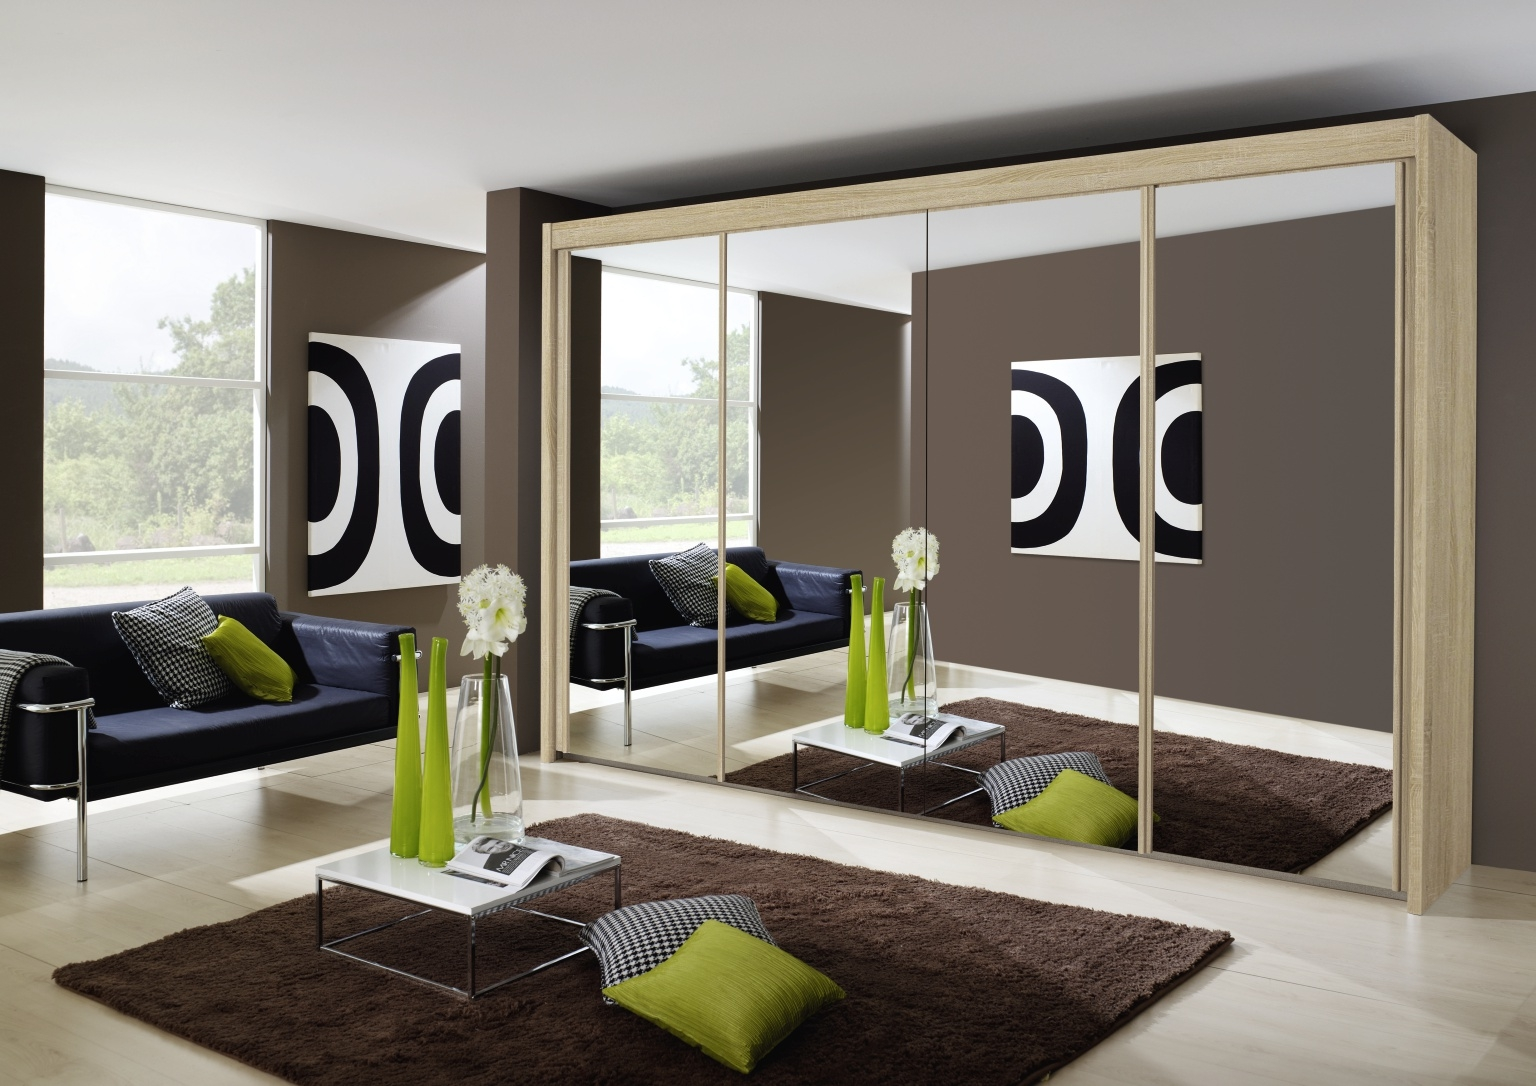 Rauch Imperial 4 Door All Mirror Sliding Wardrobe in Sonoma Oak - W 350cm